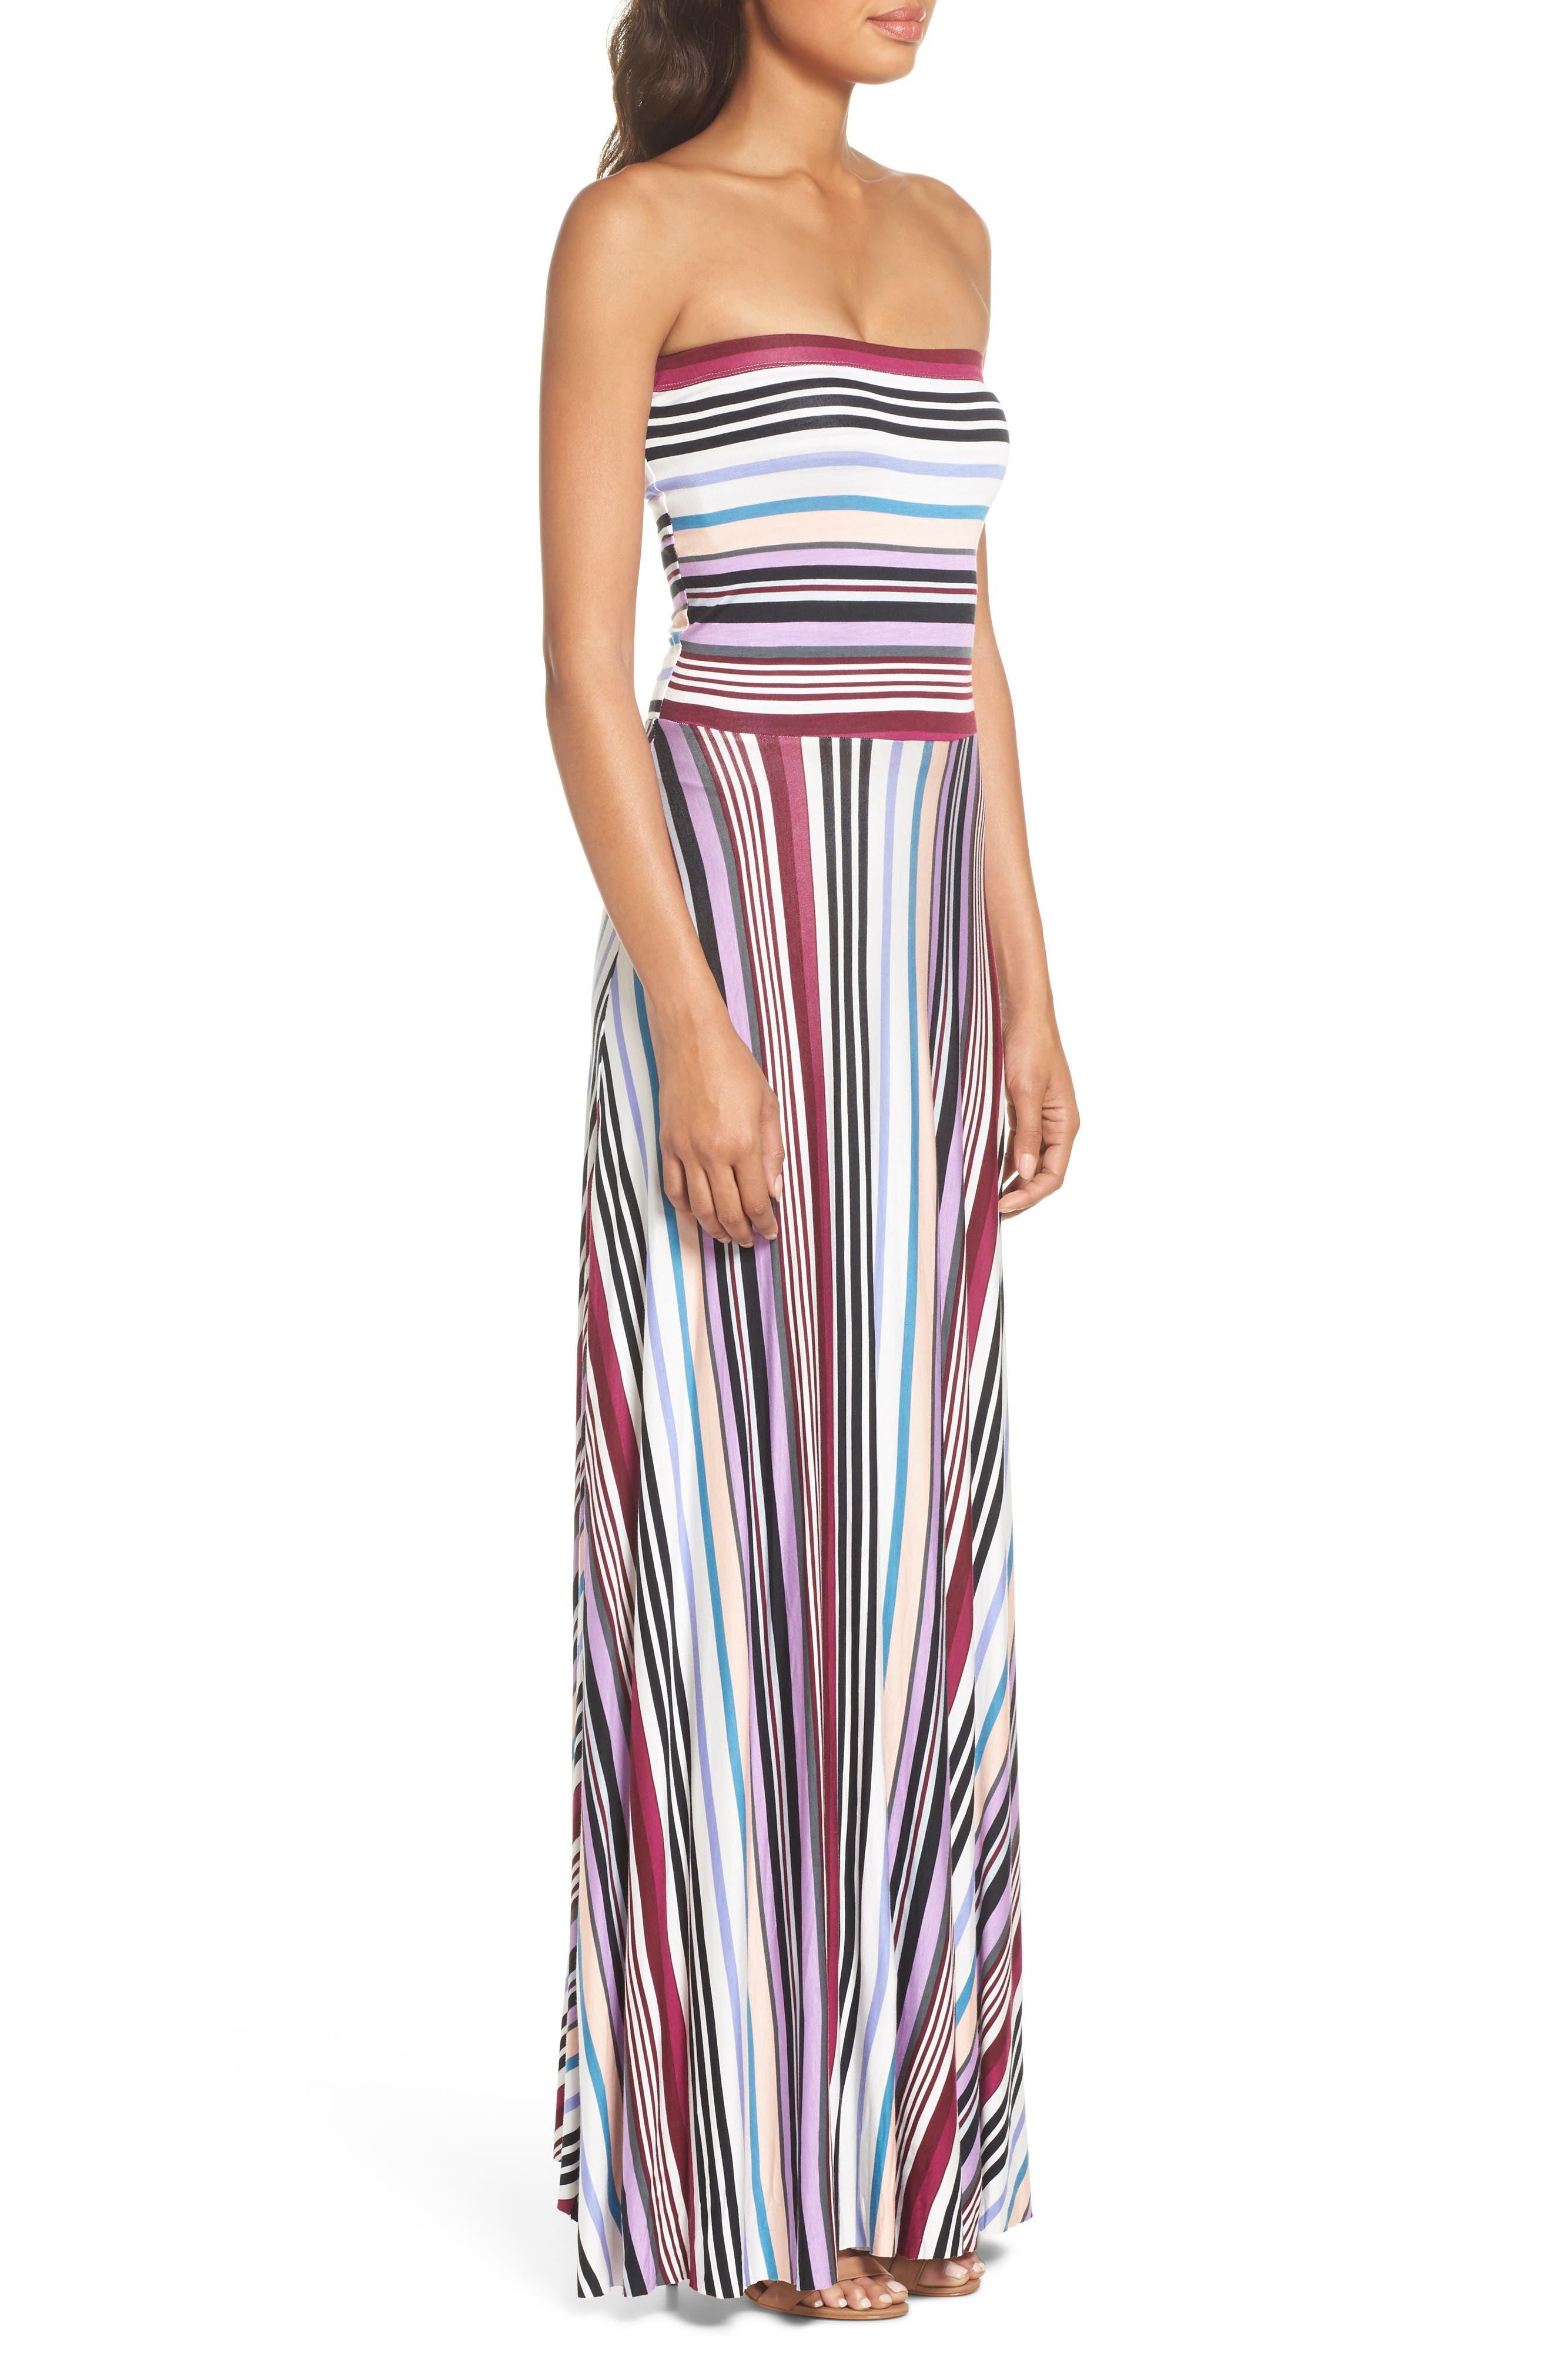 Clemette Strapless Maxi Dress,                             Alternate thumbnail 3, color,                             Purple Multi Stripe